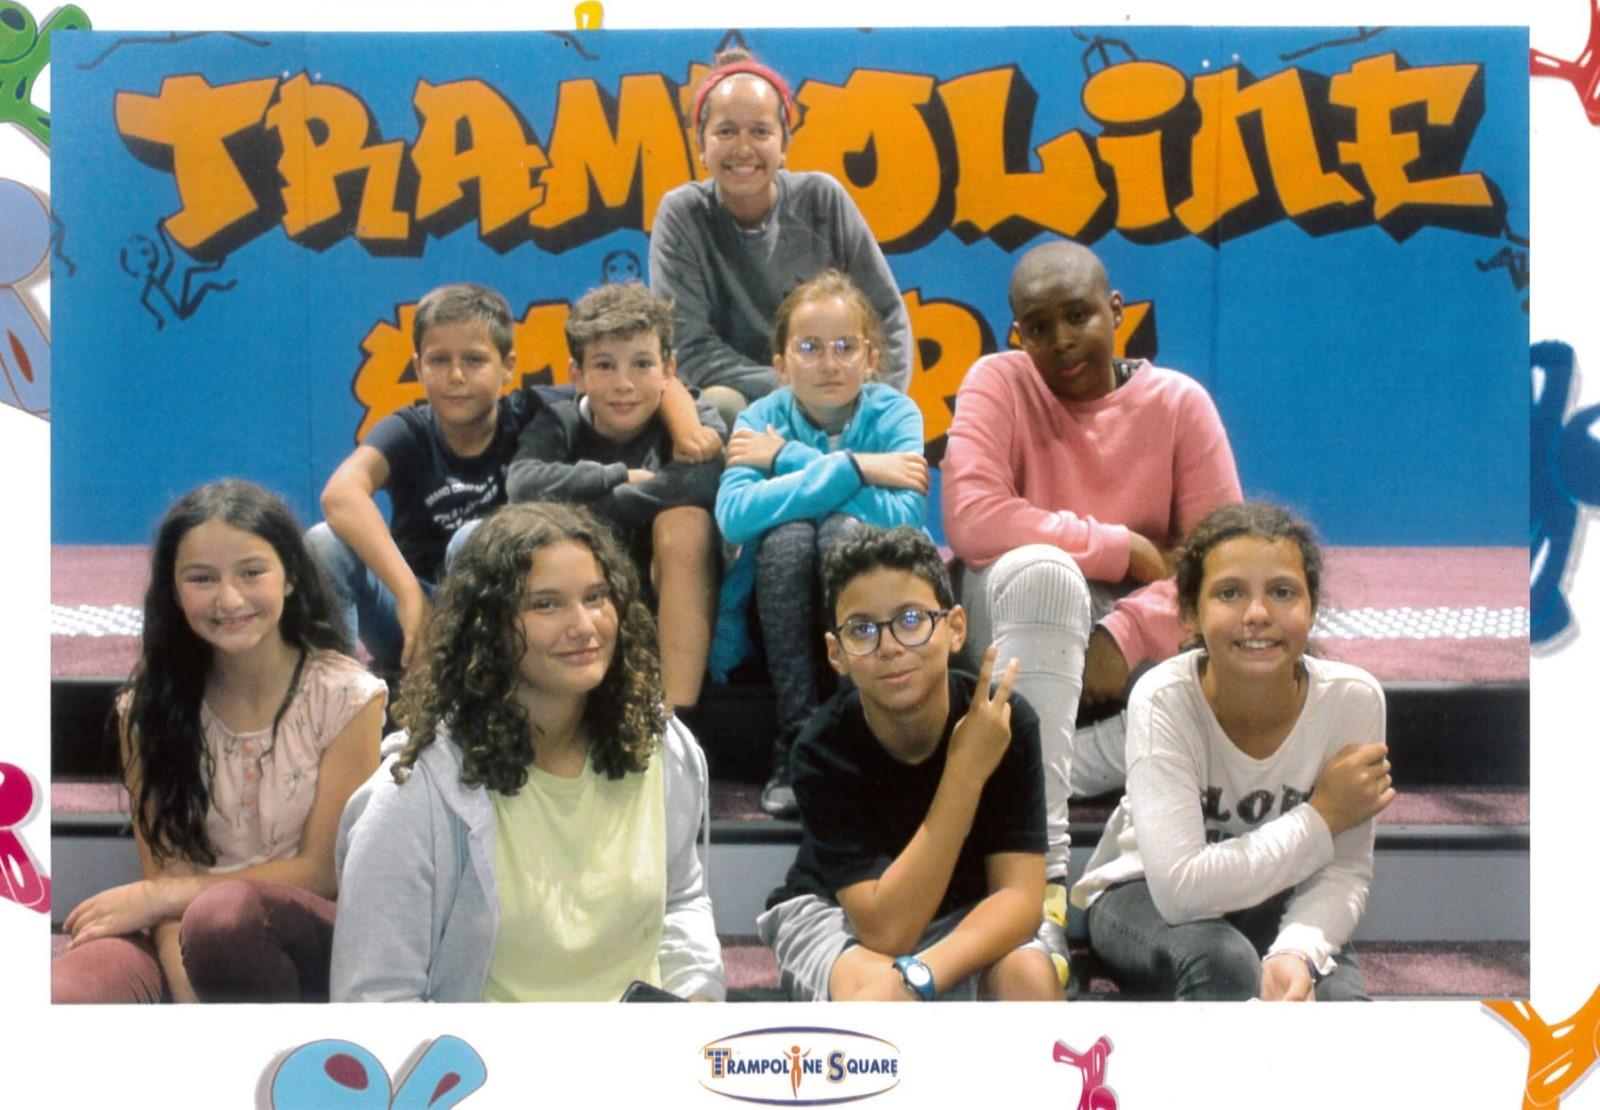 Trampo-1600x1200